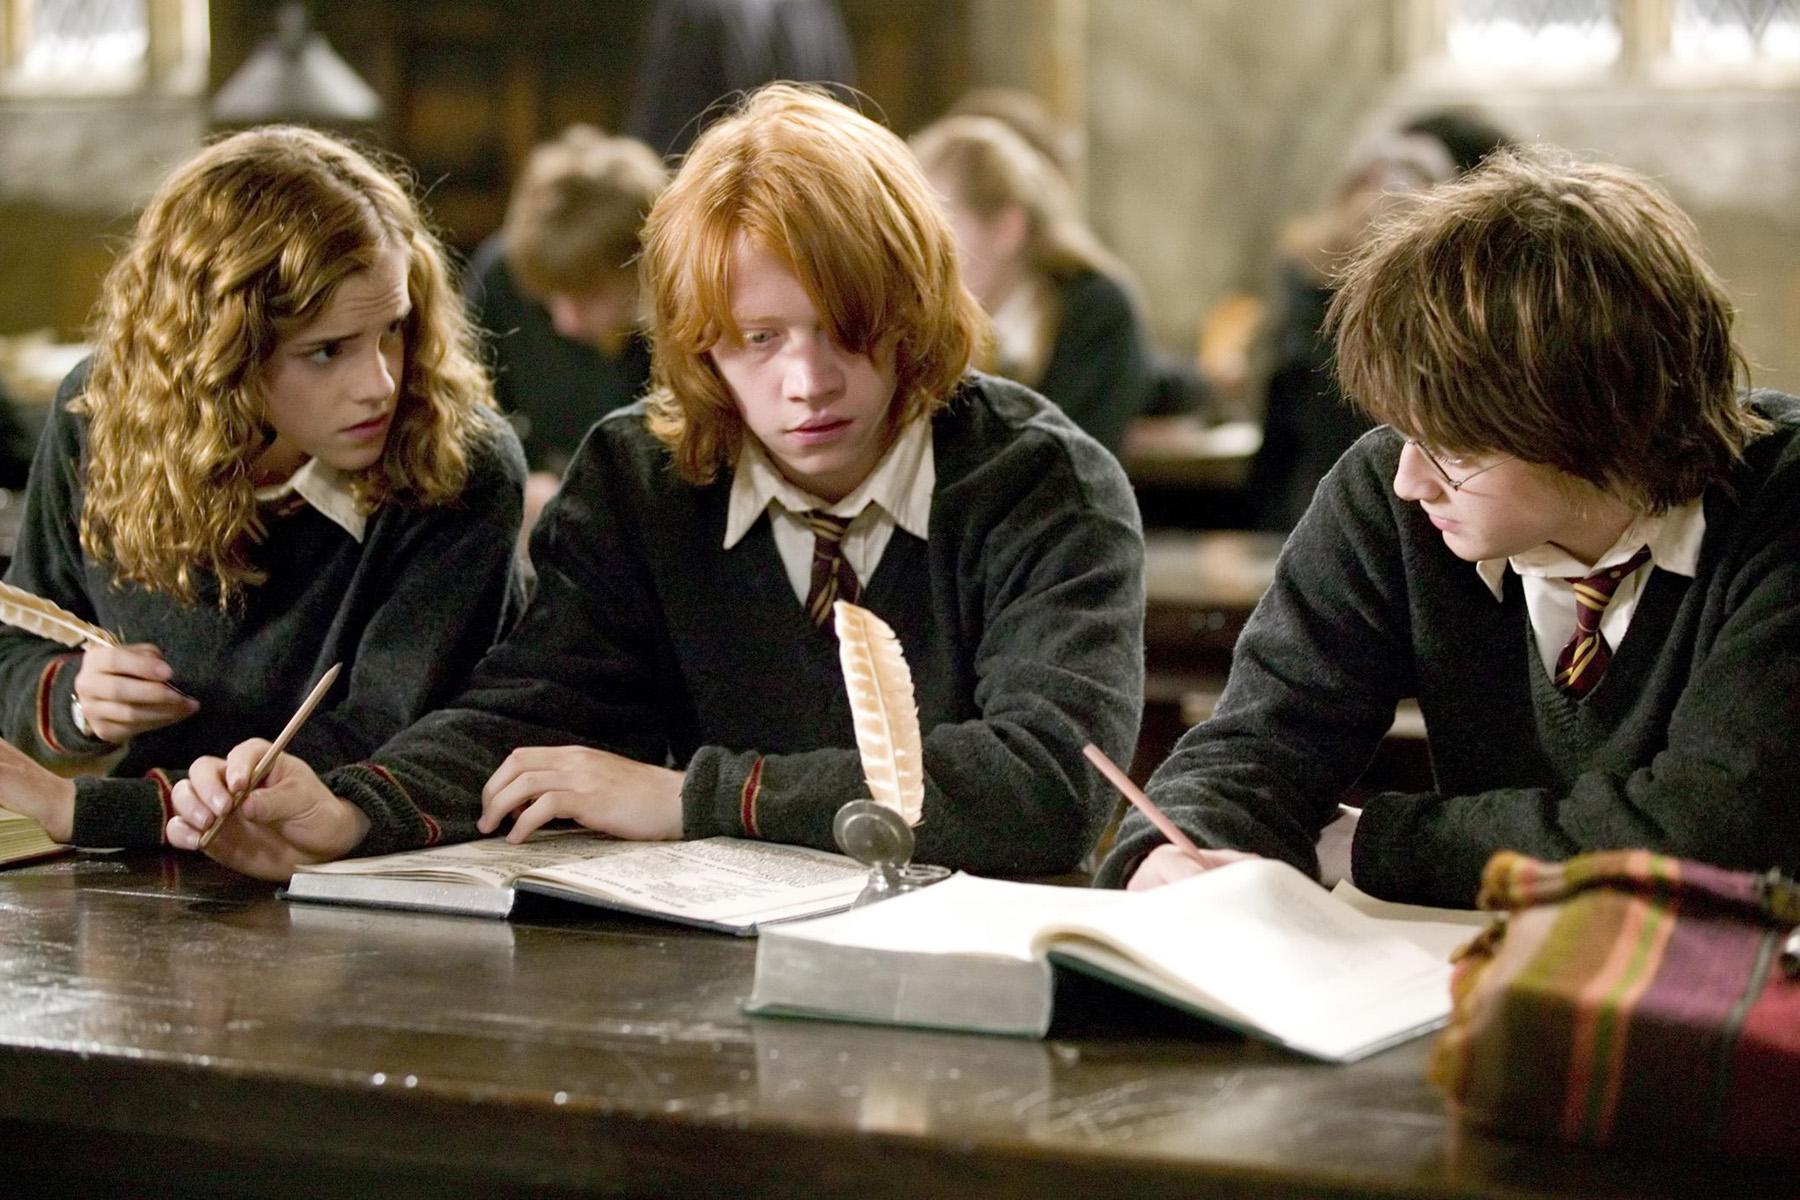 Harry Potter, Hermoine Granger, Ron Weasley, Hogwarts, Books, Fantastic Beasts